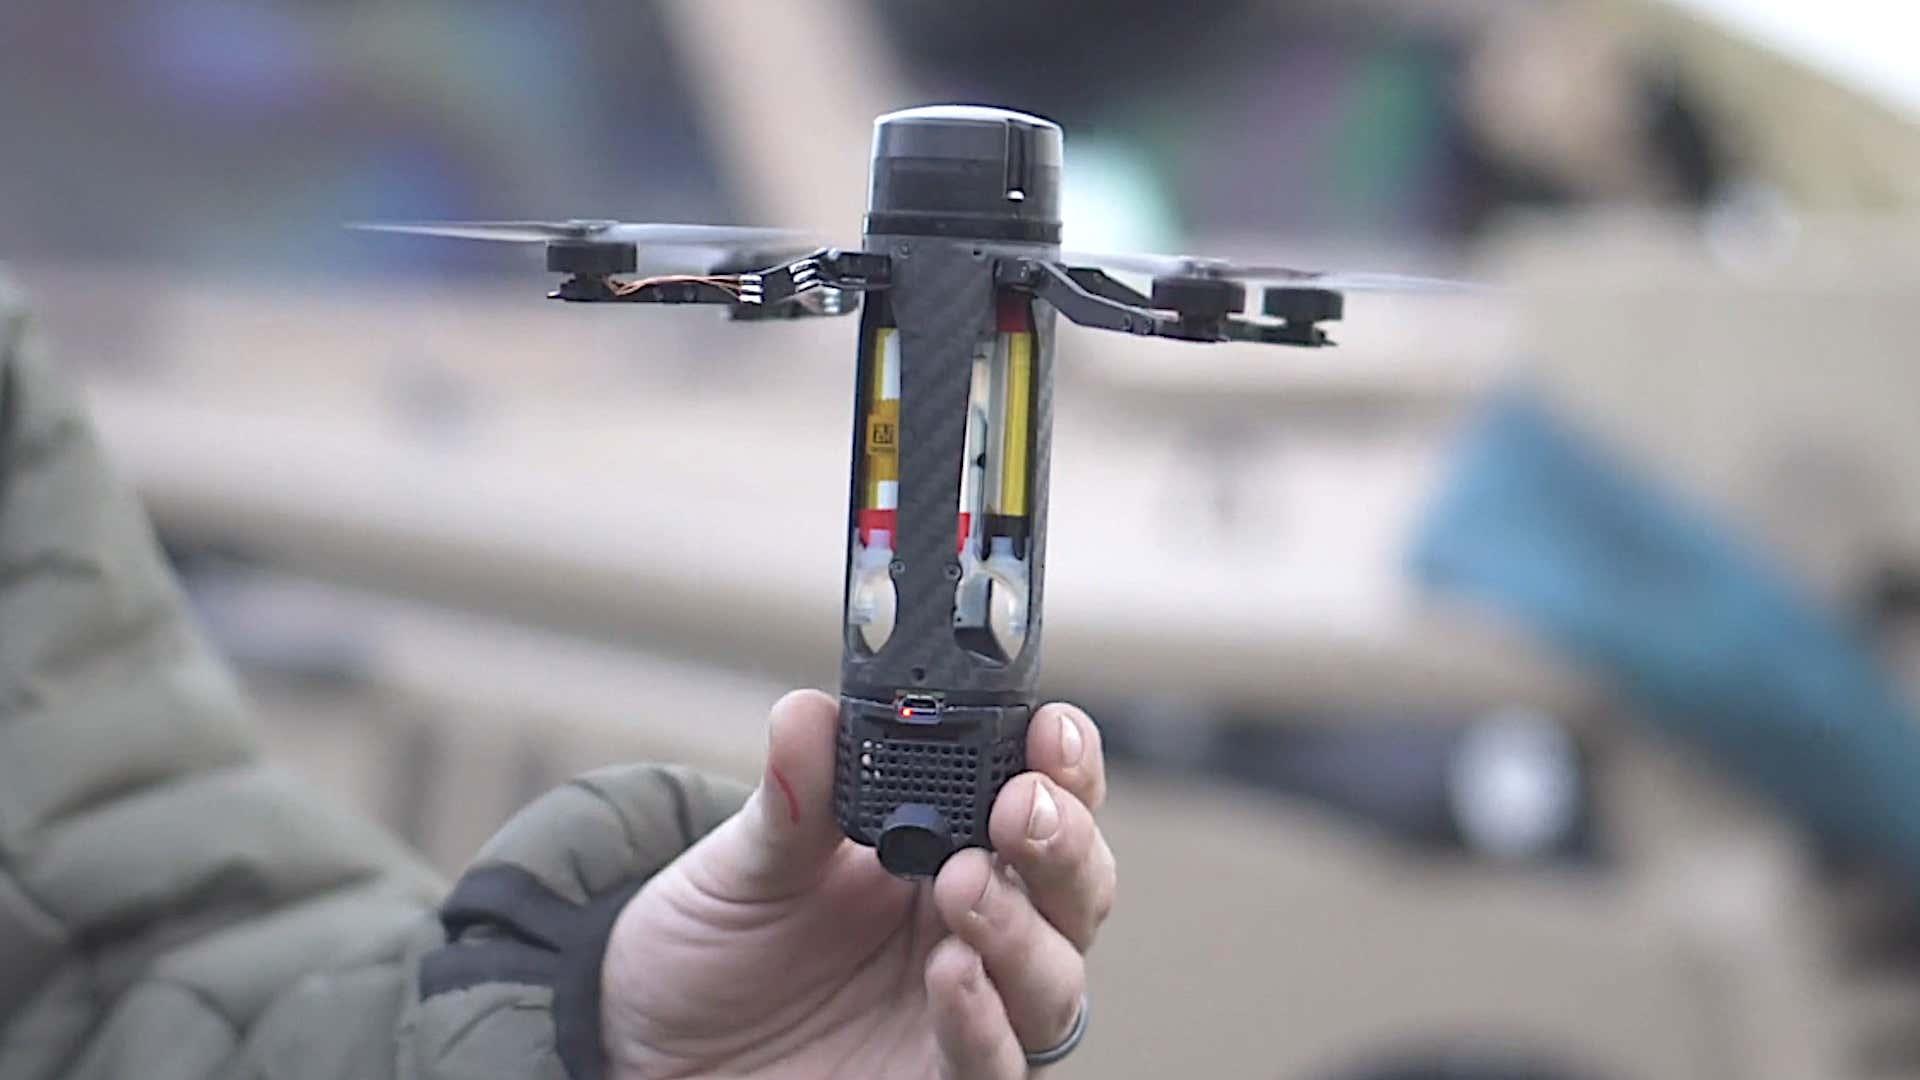 Ročna granata - dron  Vir: Warzone, Twitter